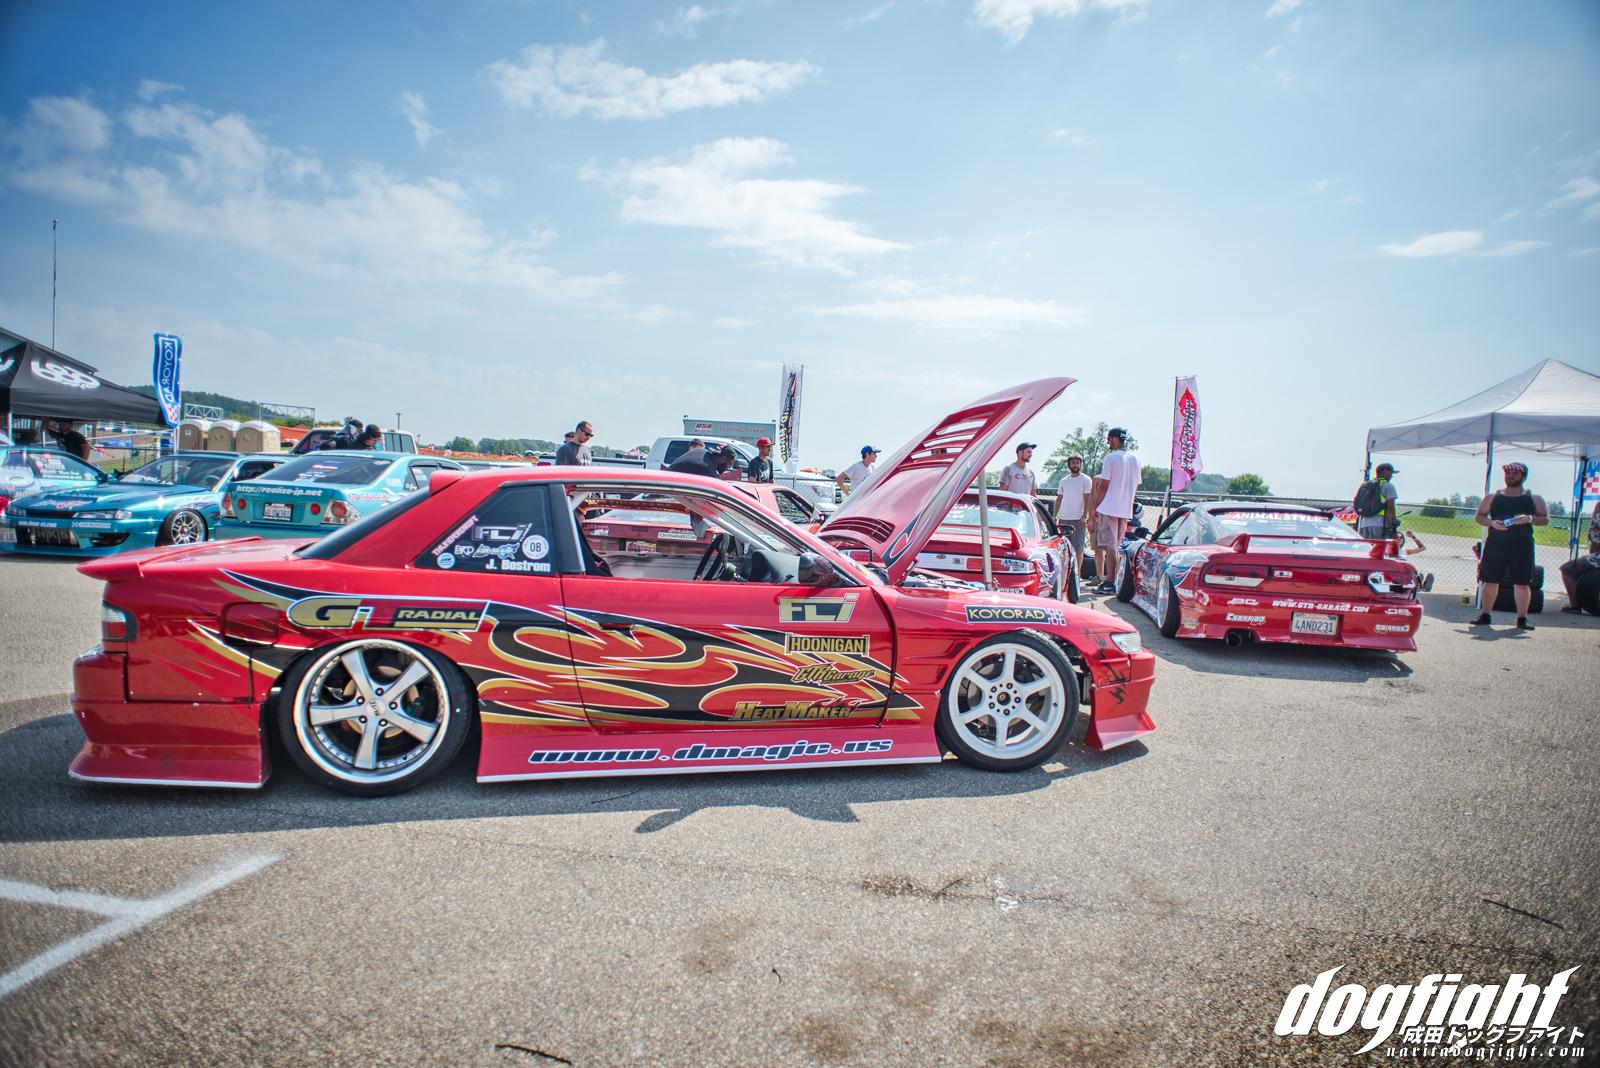 Drift team animal style 2014 parking lot fun - 3 9